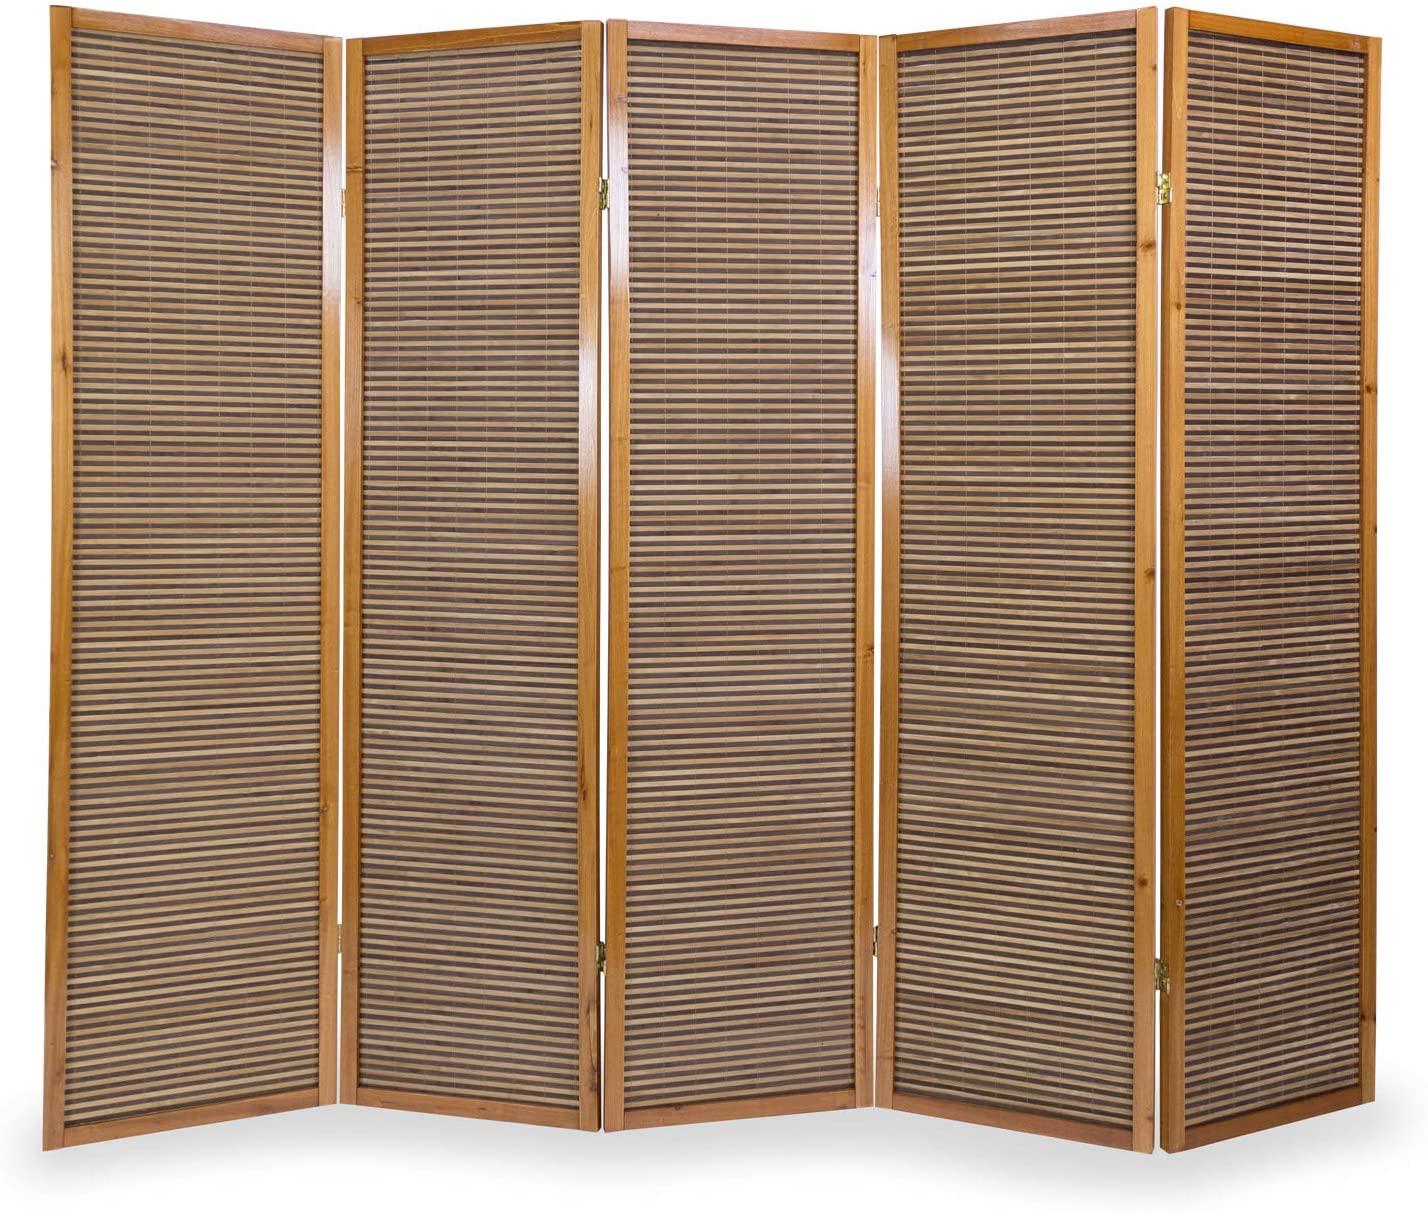 Full Size of Paravent Bambus Balkon Homestyle4u 383 Garten Bett Wohnzimmer Paravent Bambus Balkon